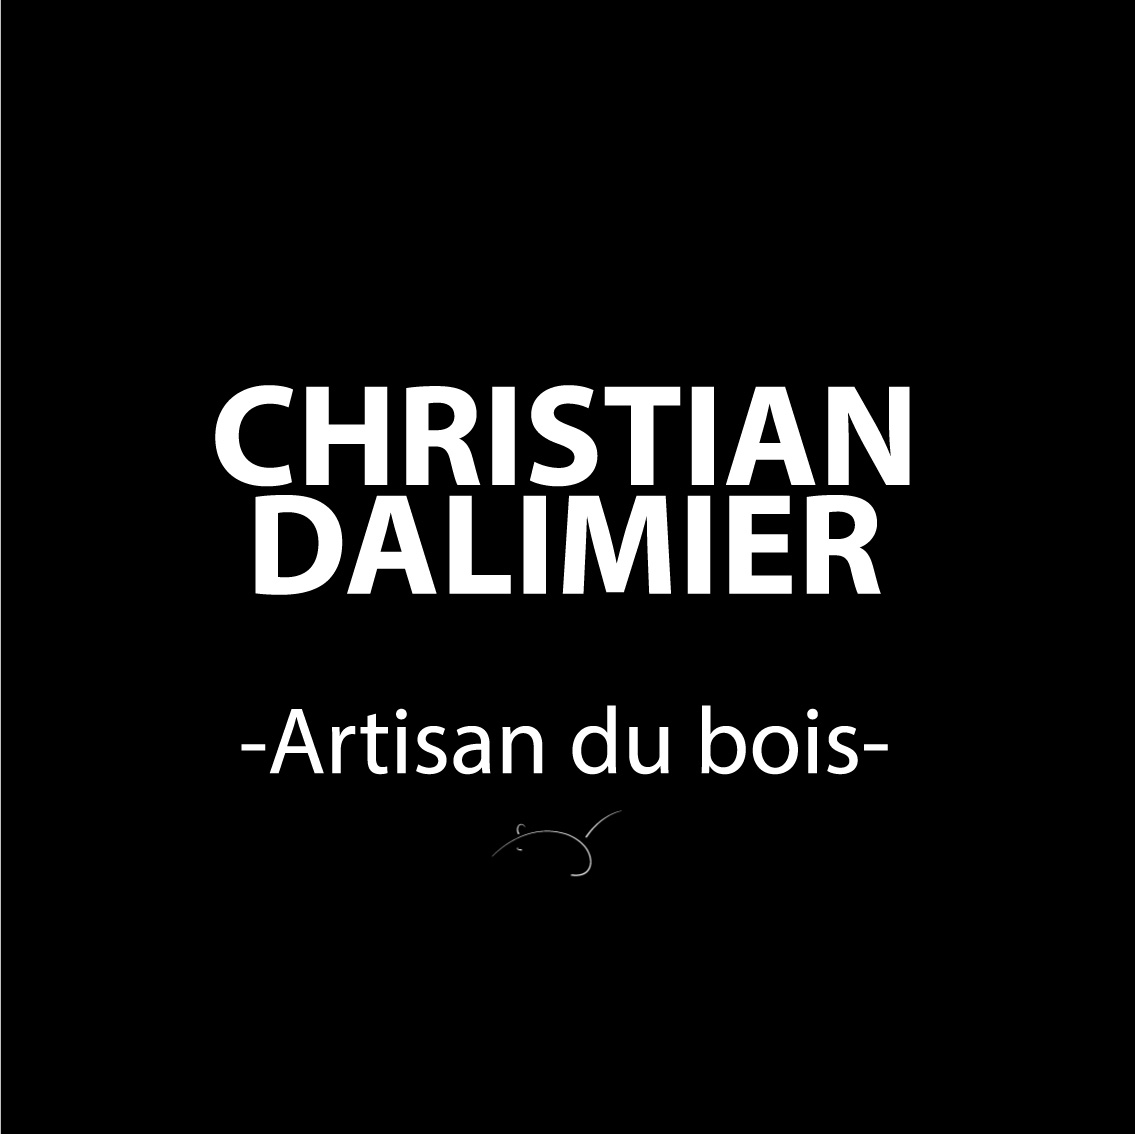 Christian Dalimier